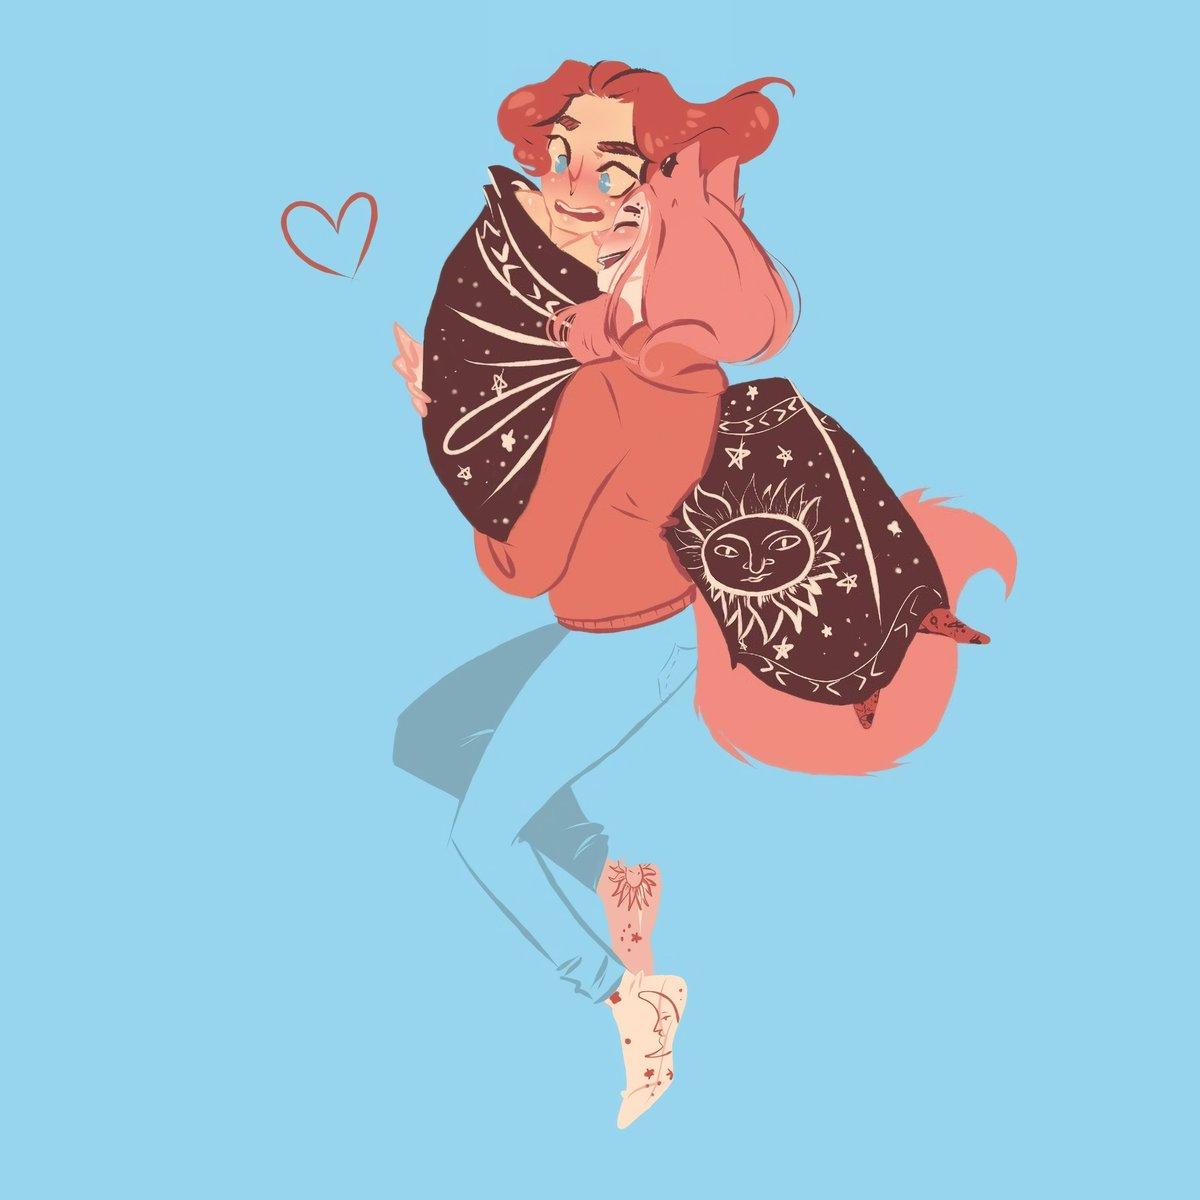 OwO 🎀 If someone steals me in this life, it will look exactly like this.  💕✨🌠🍭  Customer: @Candy__Dude Author: @gun_kobain  Tags: #love #cute #girl #boy #digitalart #art #drawing #pinkguy #guy #pinkhair #hugs #милота #девочка #мальчик #диджиталарт #арт #рисунок #обнимашки